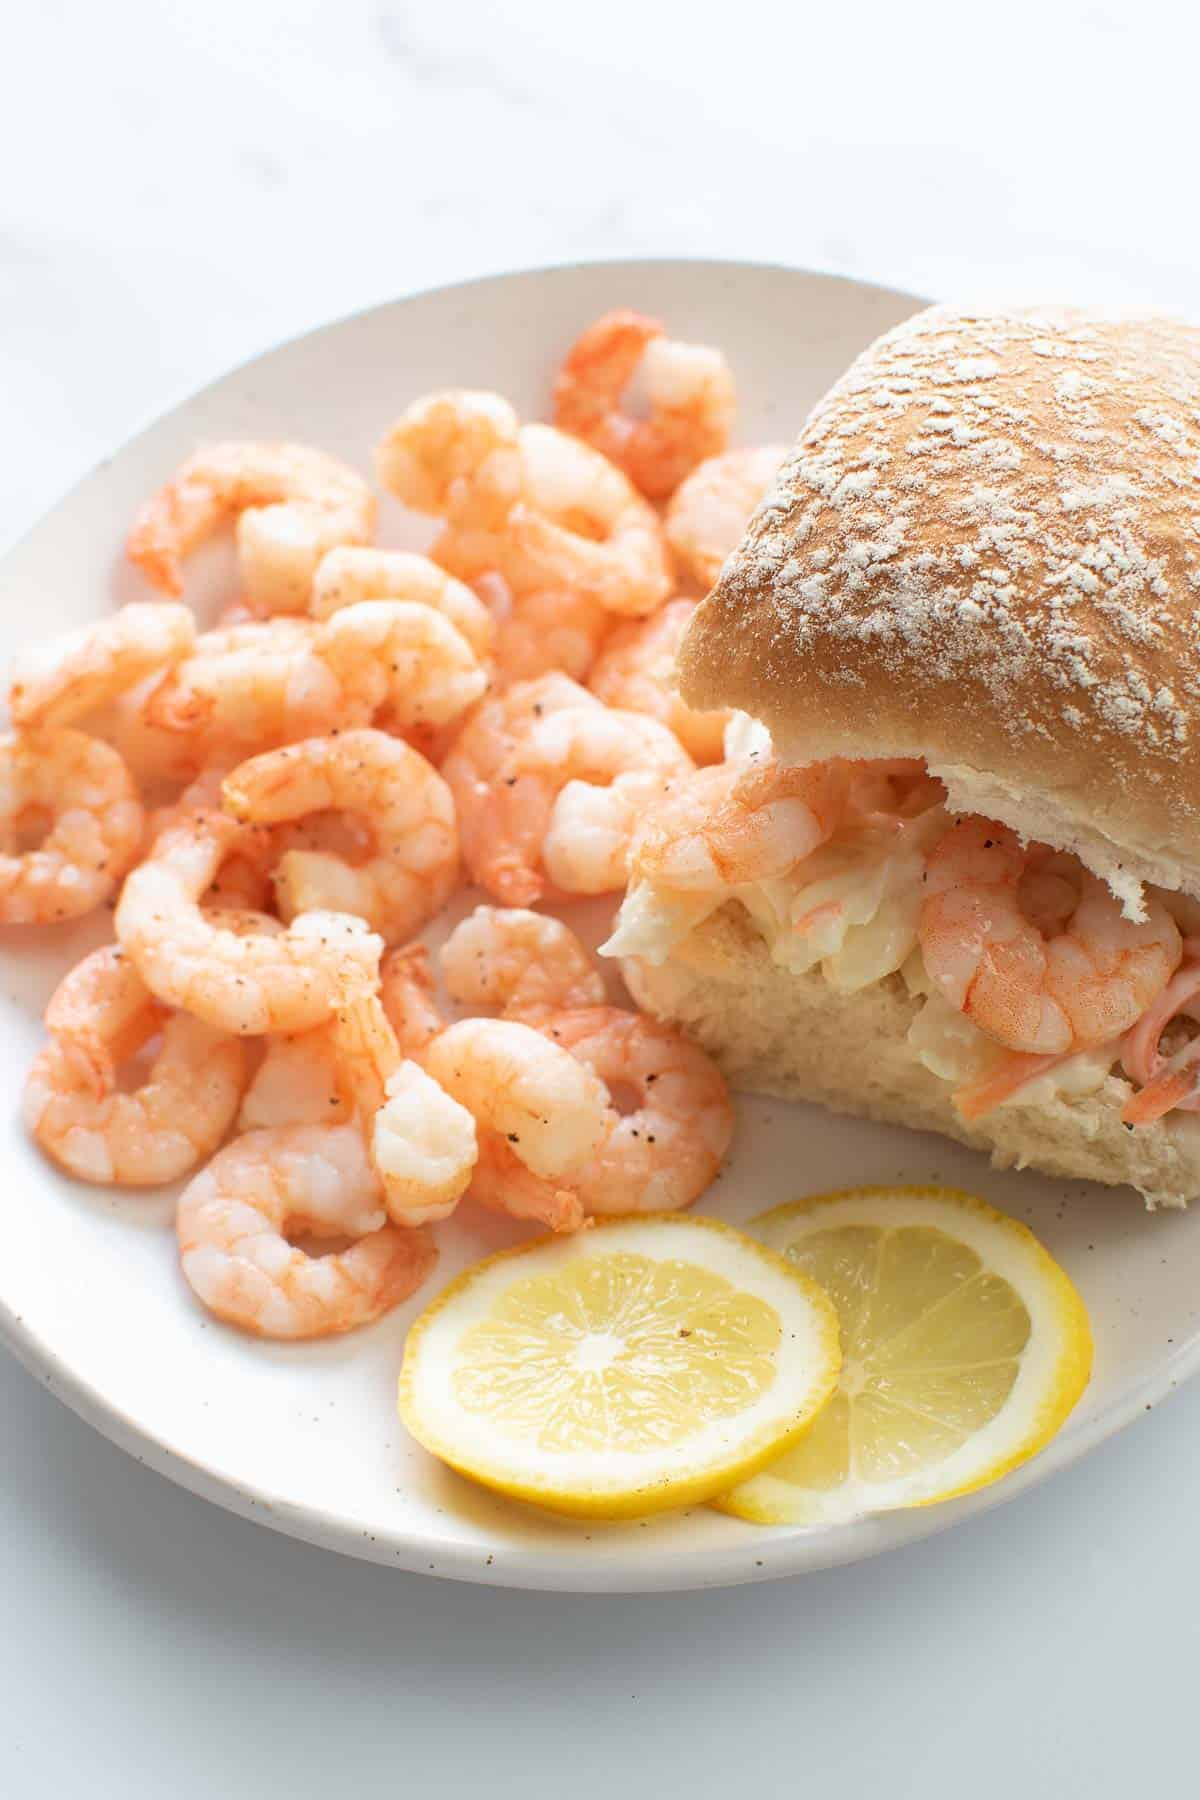 Shrimp sliders with coleslaw and lemon slices.